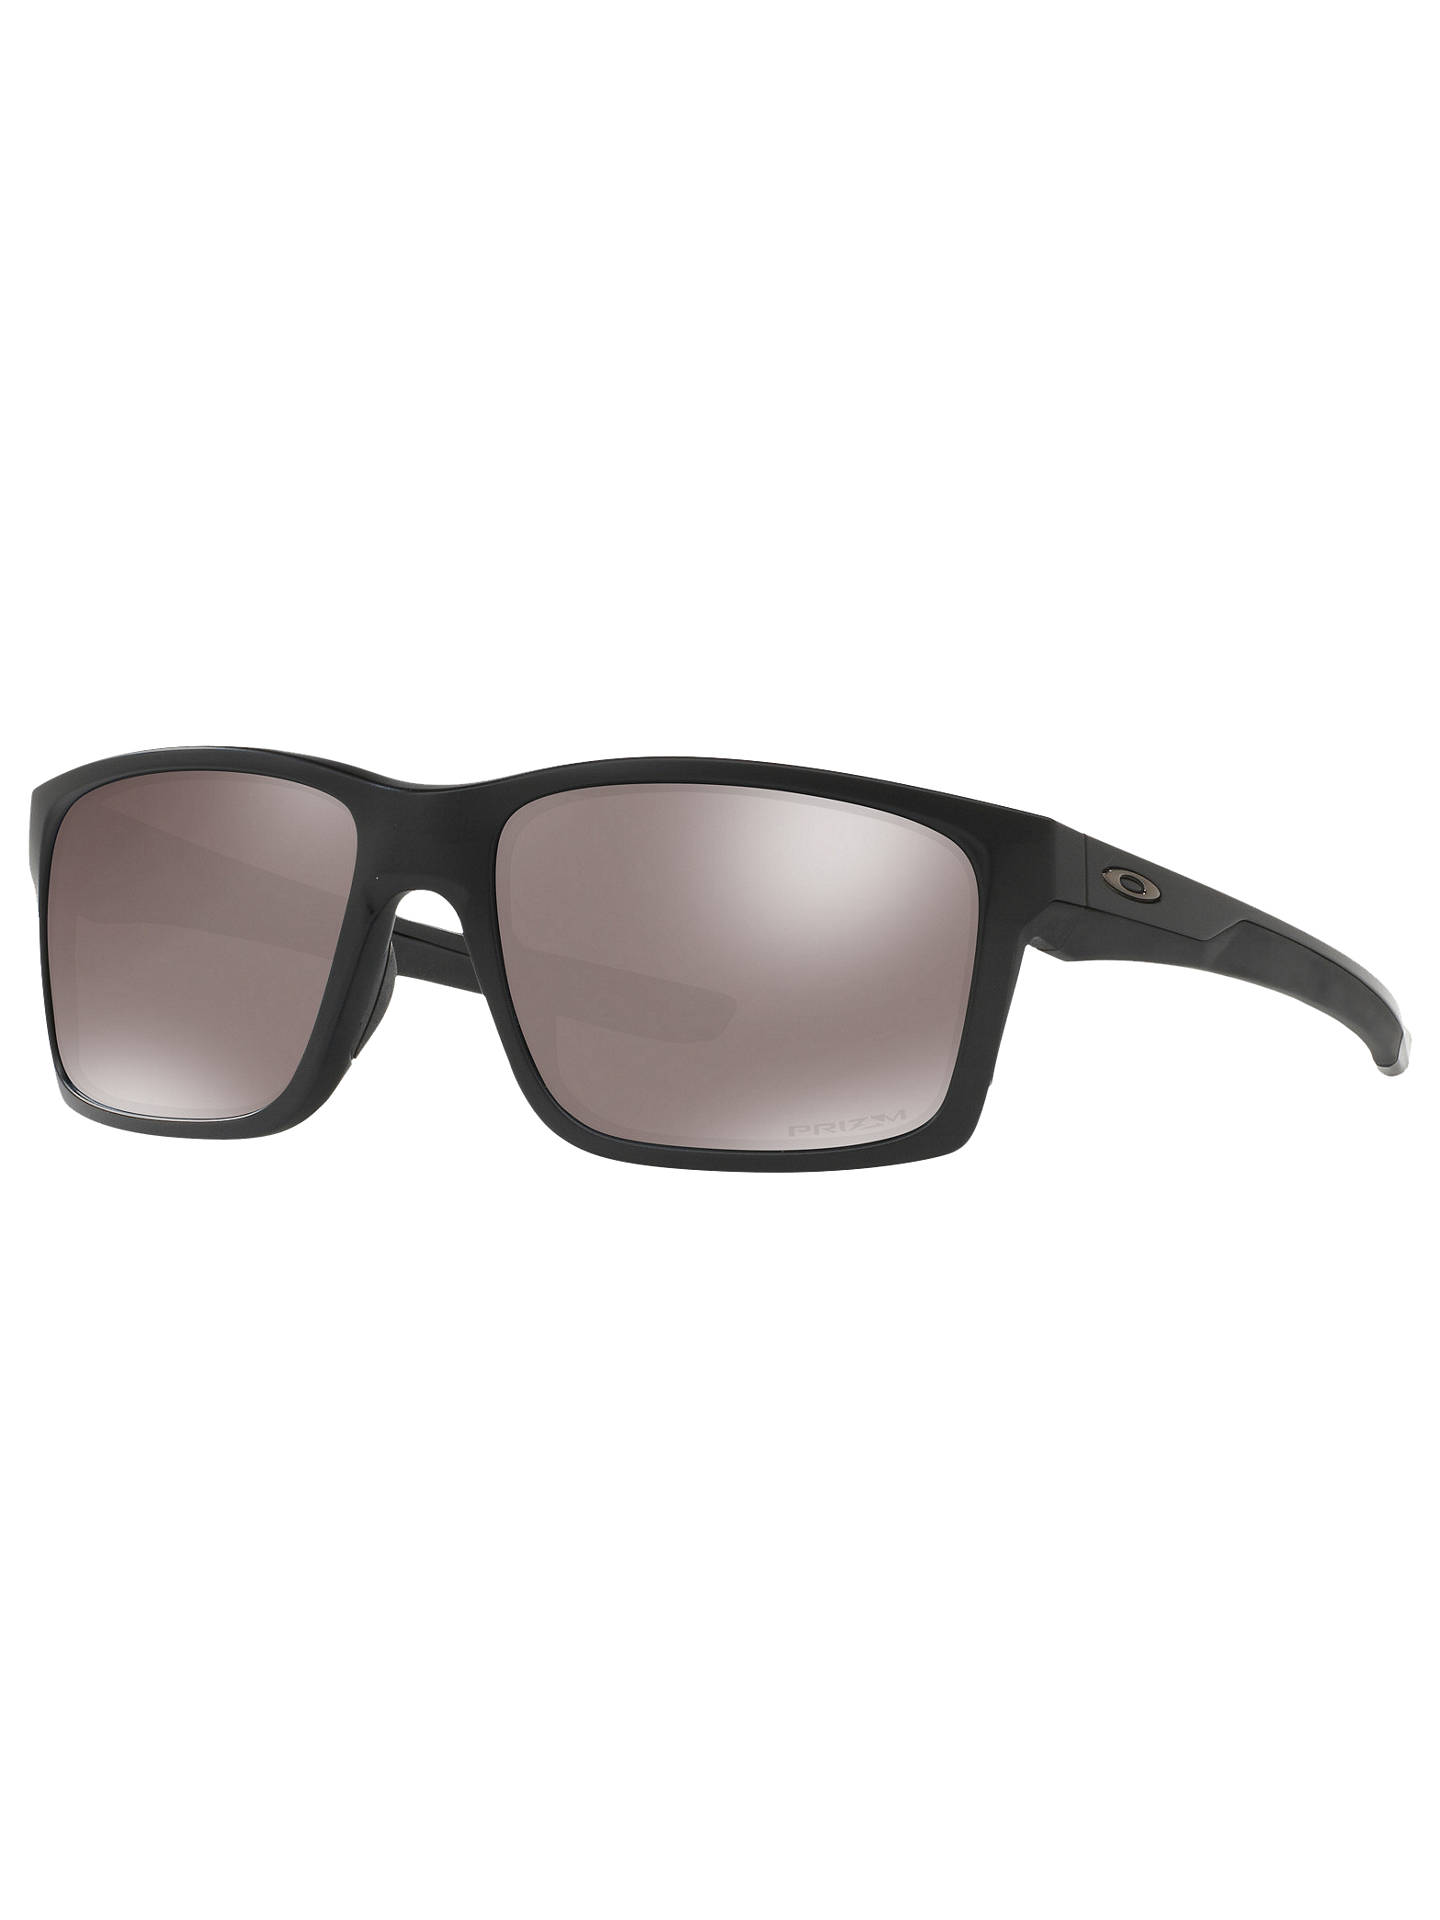 5971b35967 Oakley OO9264 Mainlink Prizm Polarised Rectangular Sunglasses at ...